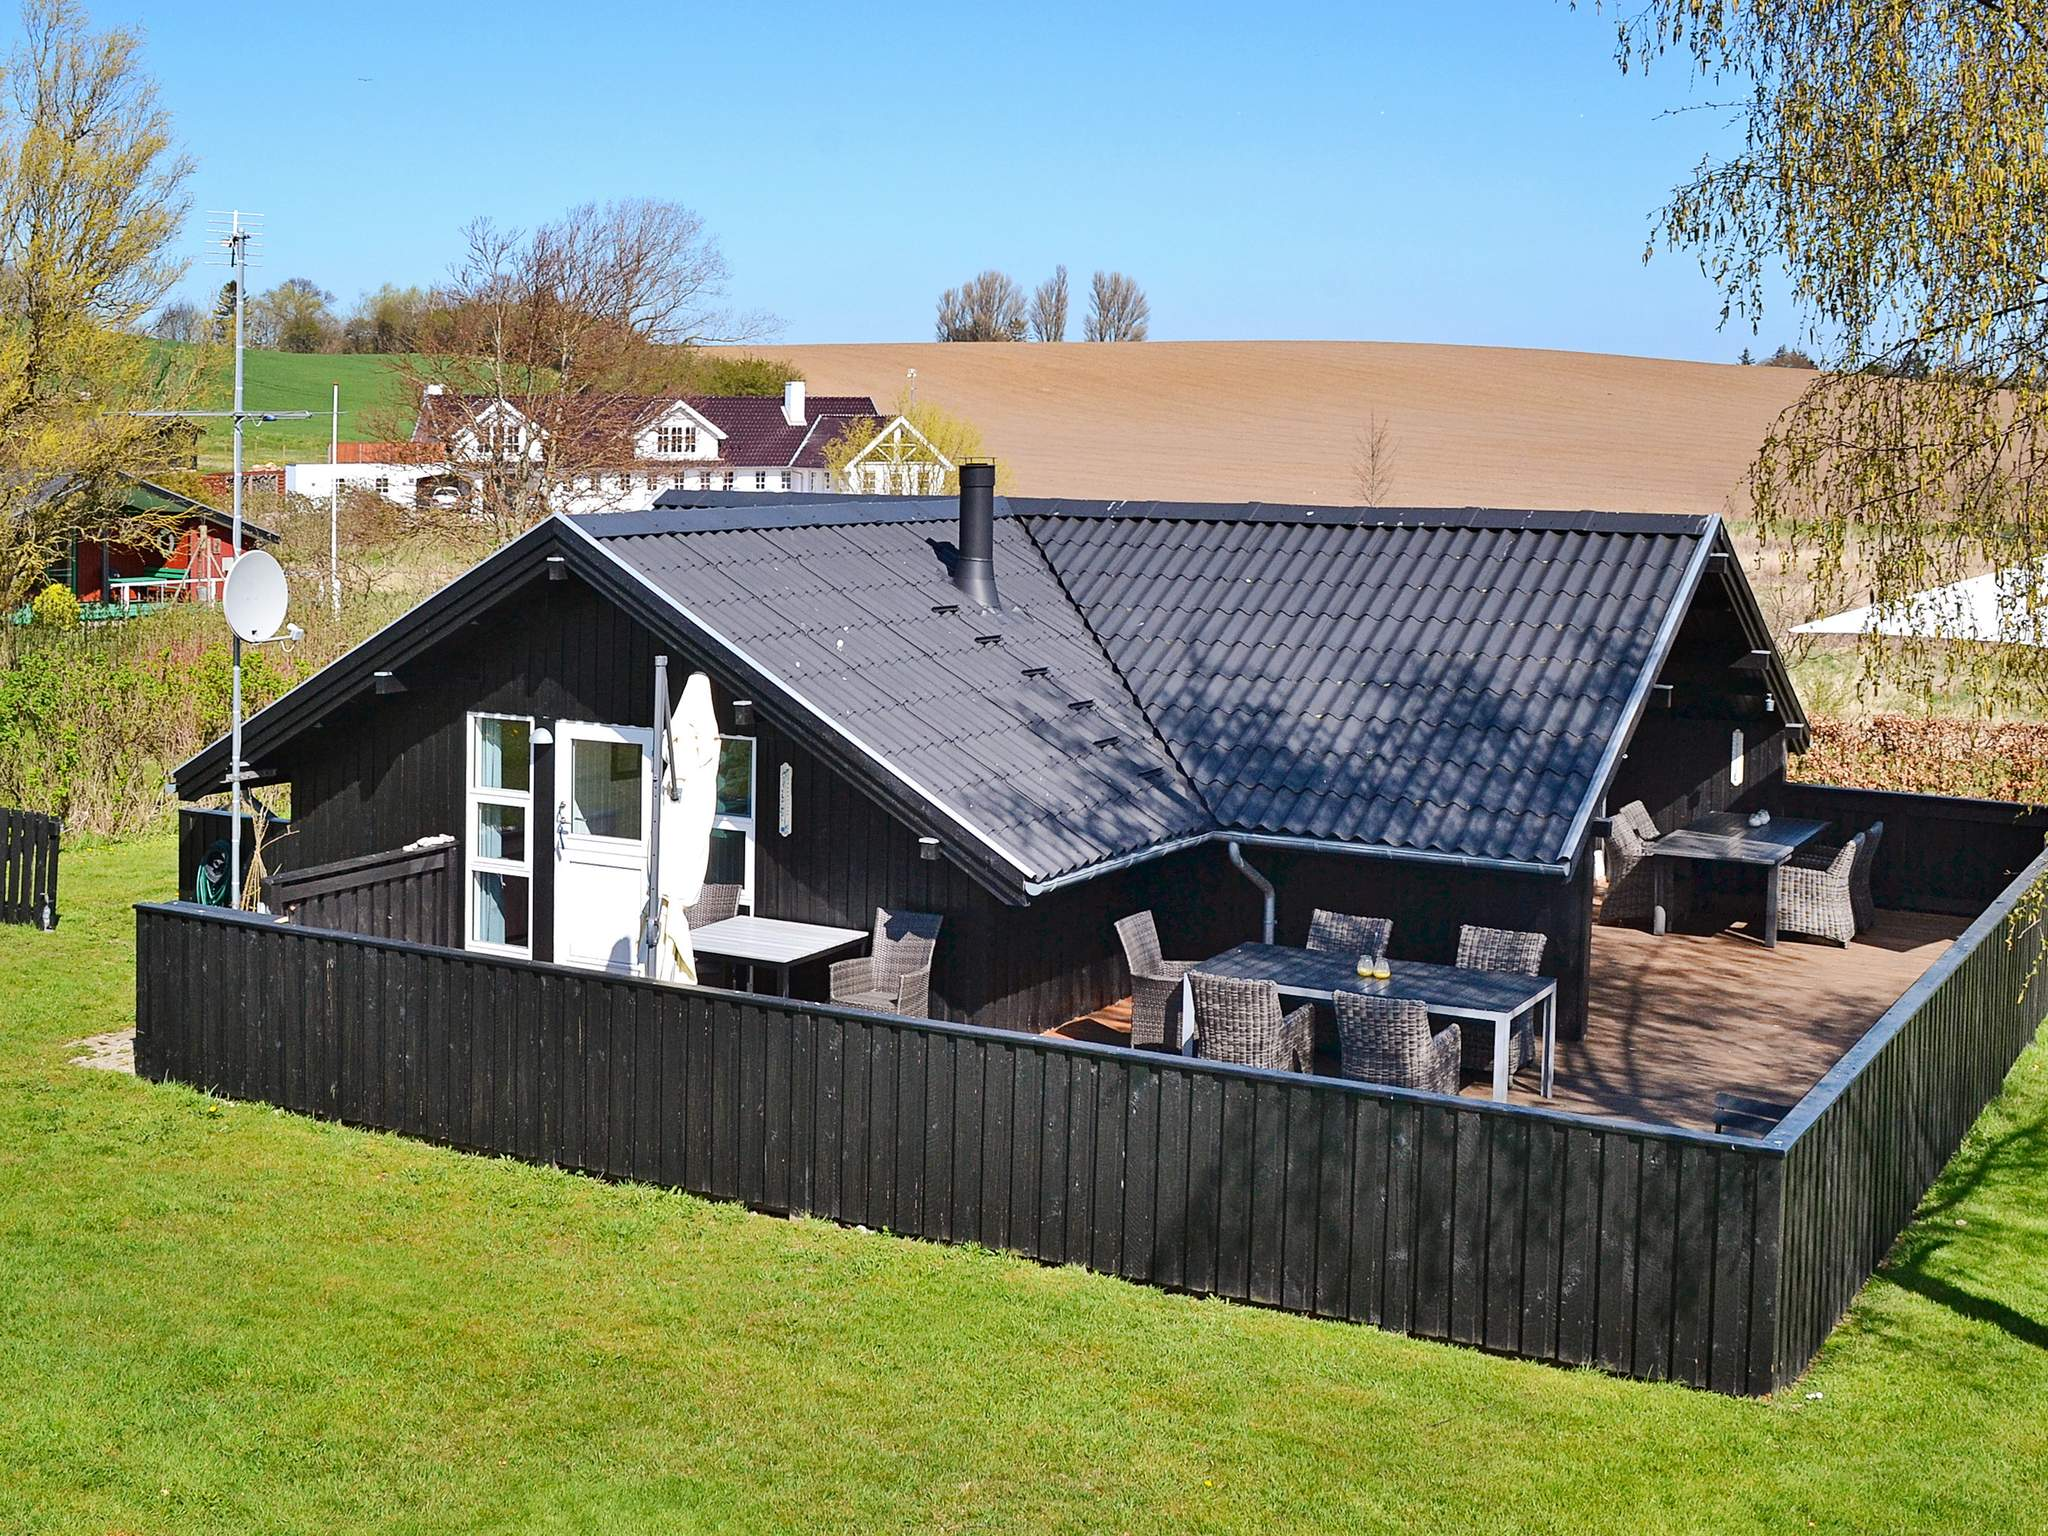 Ferienhaus Brunshuse (1625439), Haarby, , Fünen, Dänemark, Bild 1